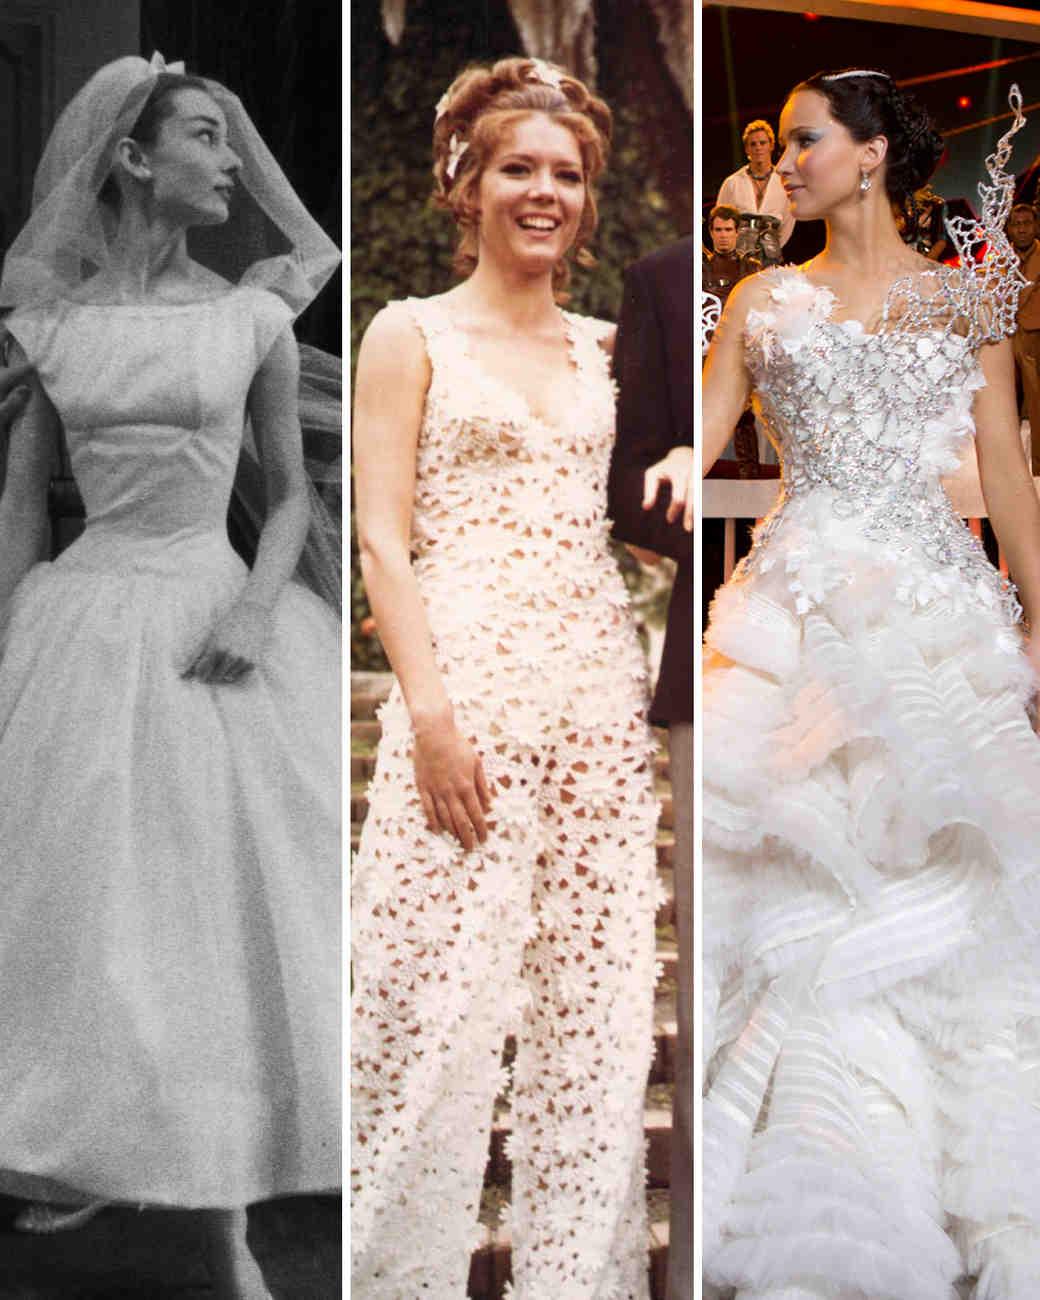 The Most Iconic Movie Wedding Dresses of All Time | Martha Stewart Weddings  sc 1 st  Martha Stewart Weddings & The Most Iconic Movie Wedding Dresses of All Time | Martha Stewart ...